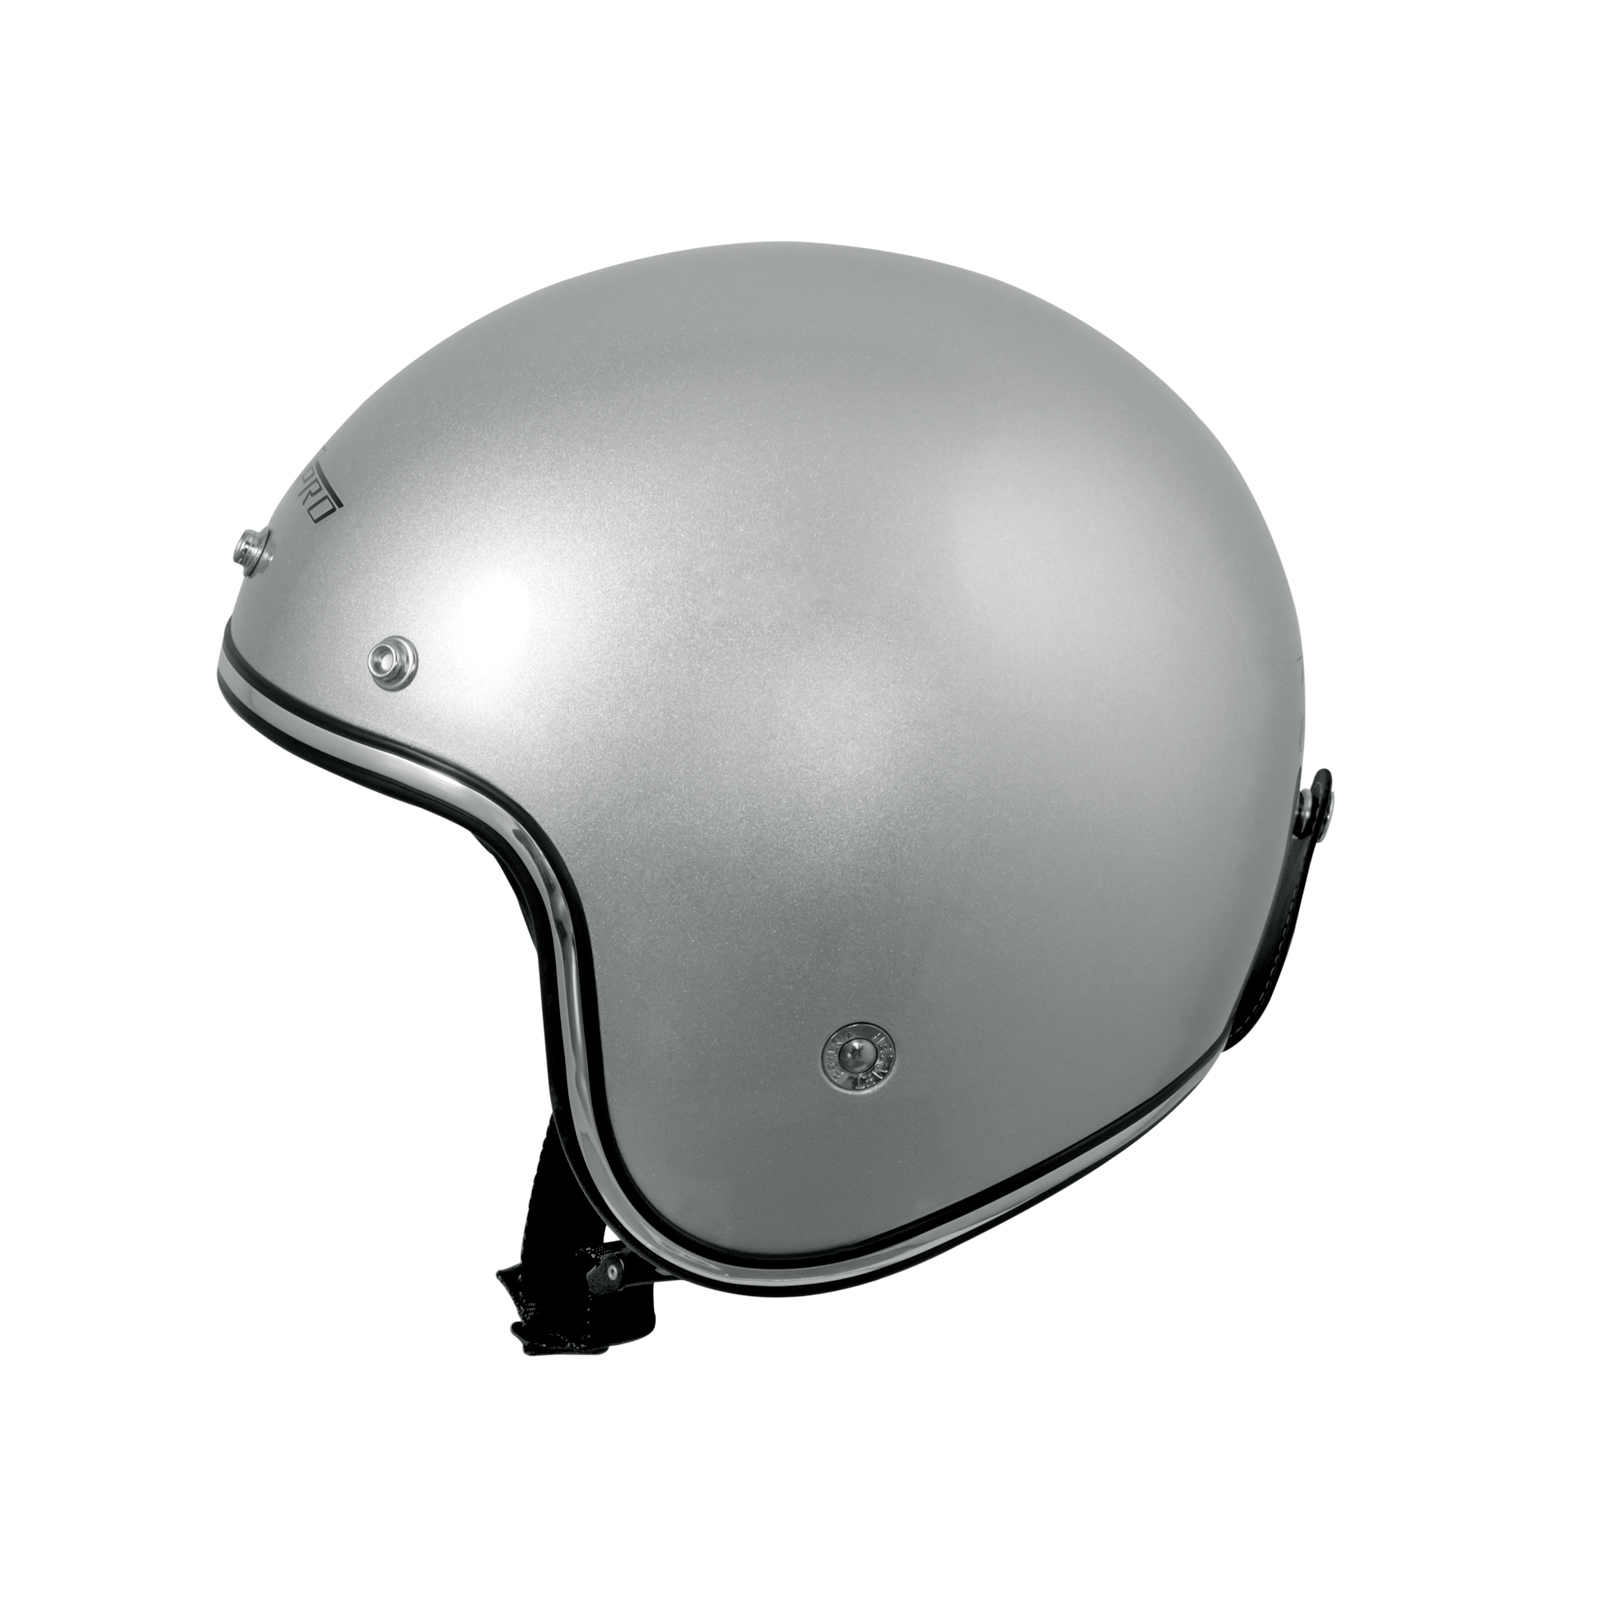 Casque-Moto-Jet-Kustom-Demi-Scooter-ECE-22-05-approbation miniature 16